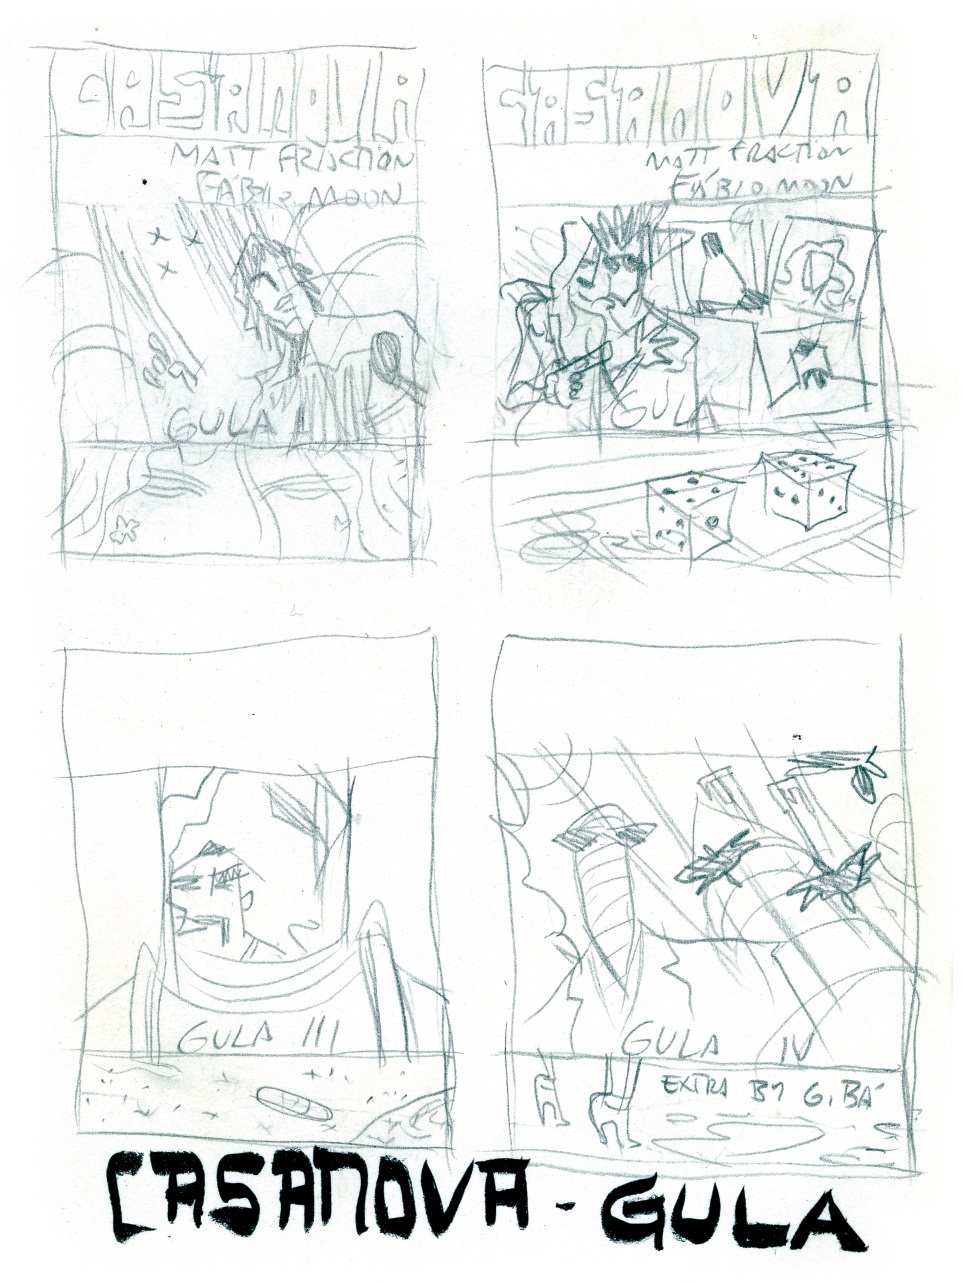 http://www.urban-comics.com/wp-content/uploads/2013/10/casanova1.jpg